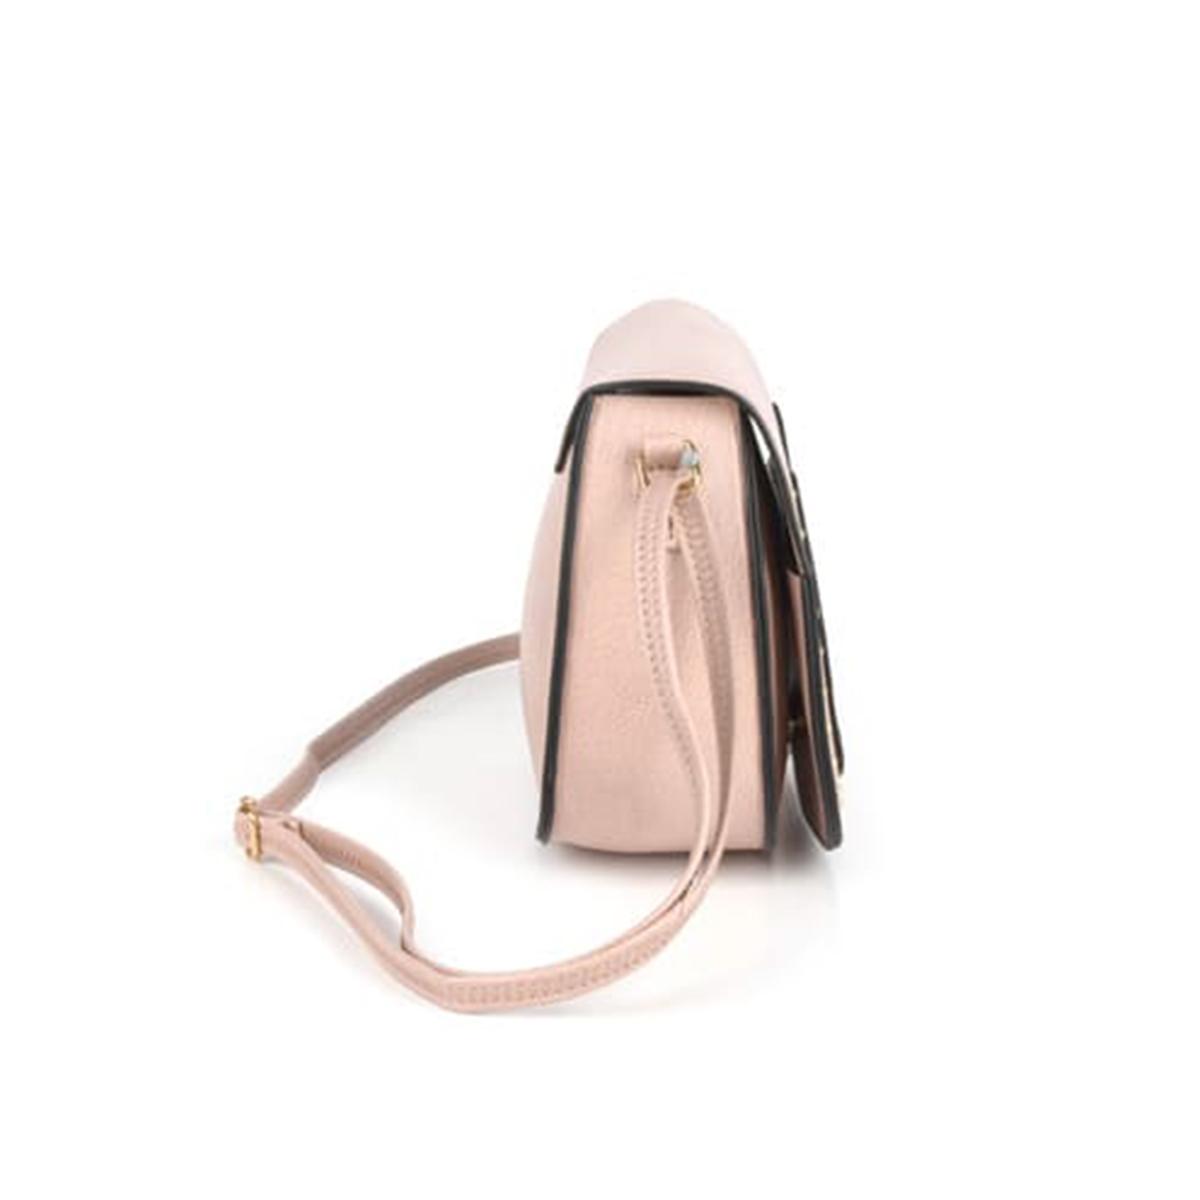 Bolsa Elegante Feminina Gash Pequena Transversal Longa